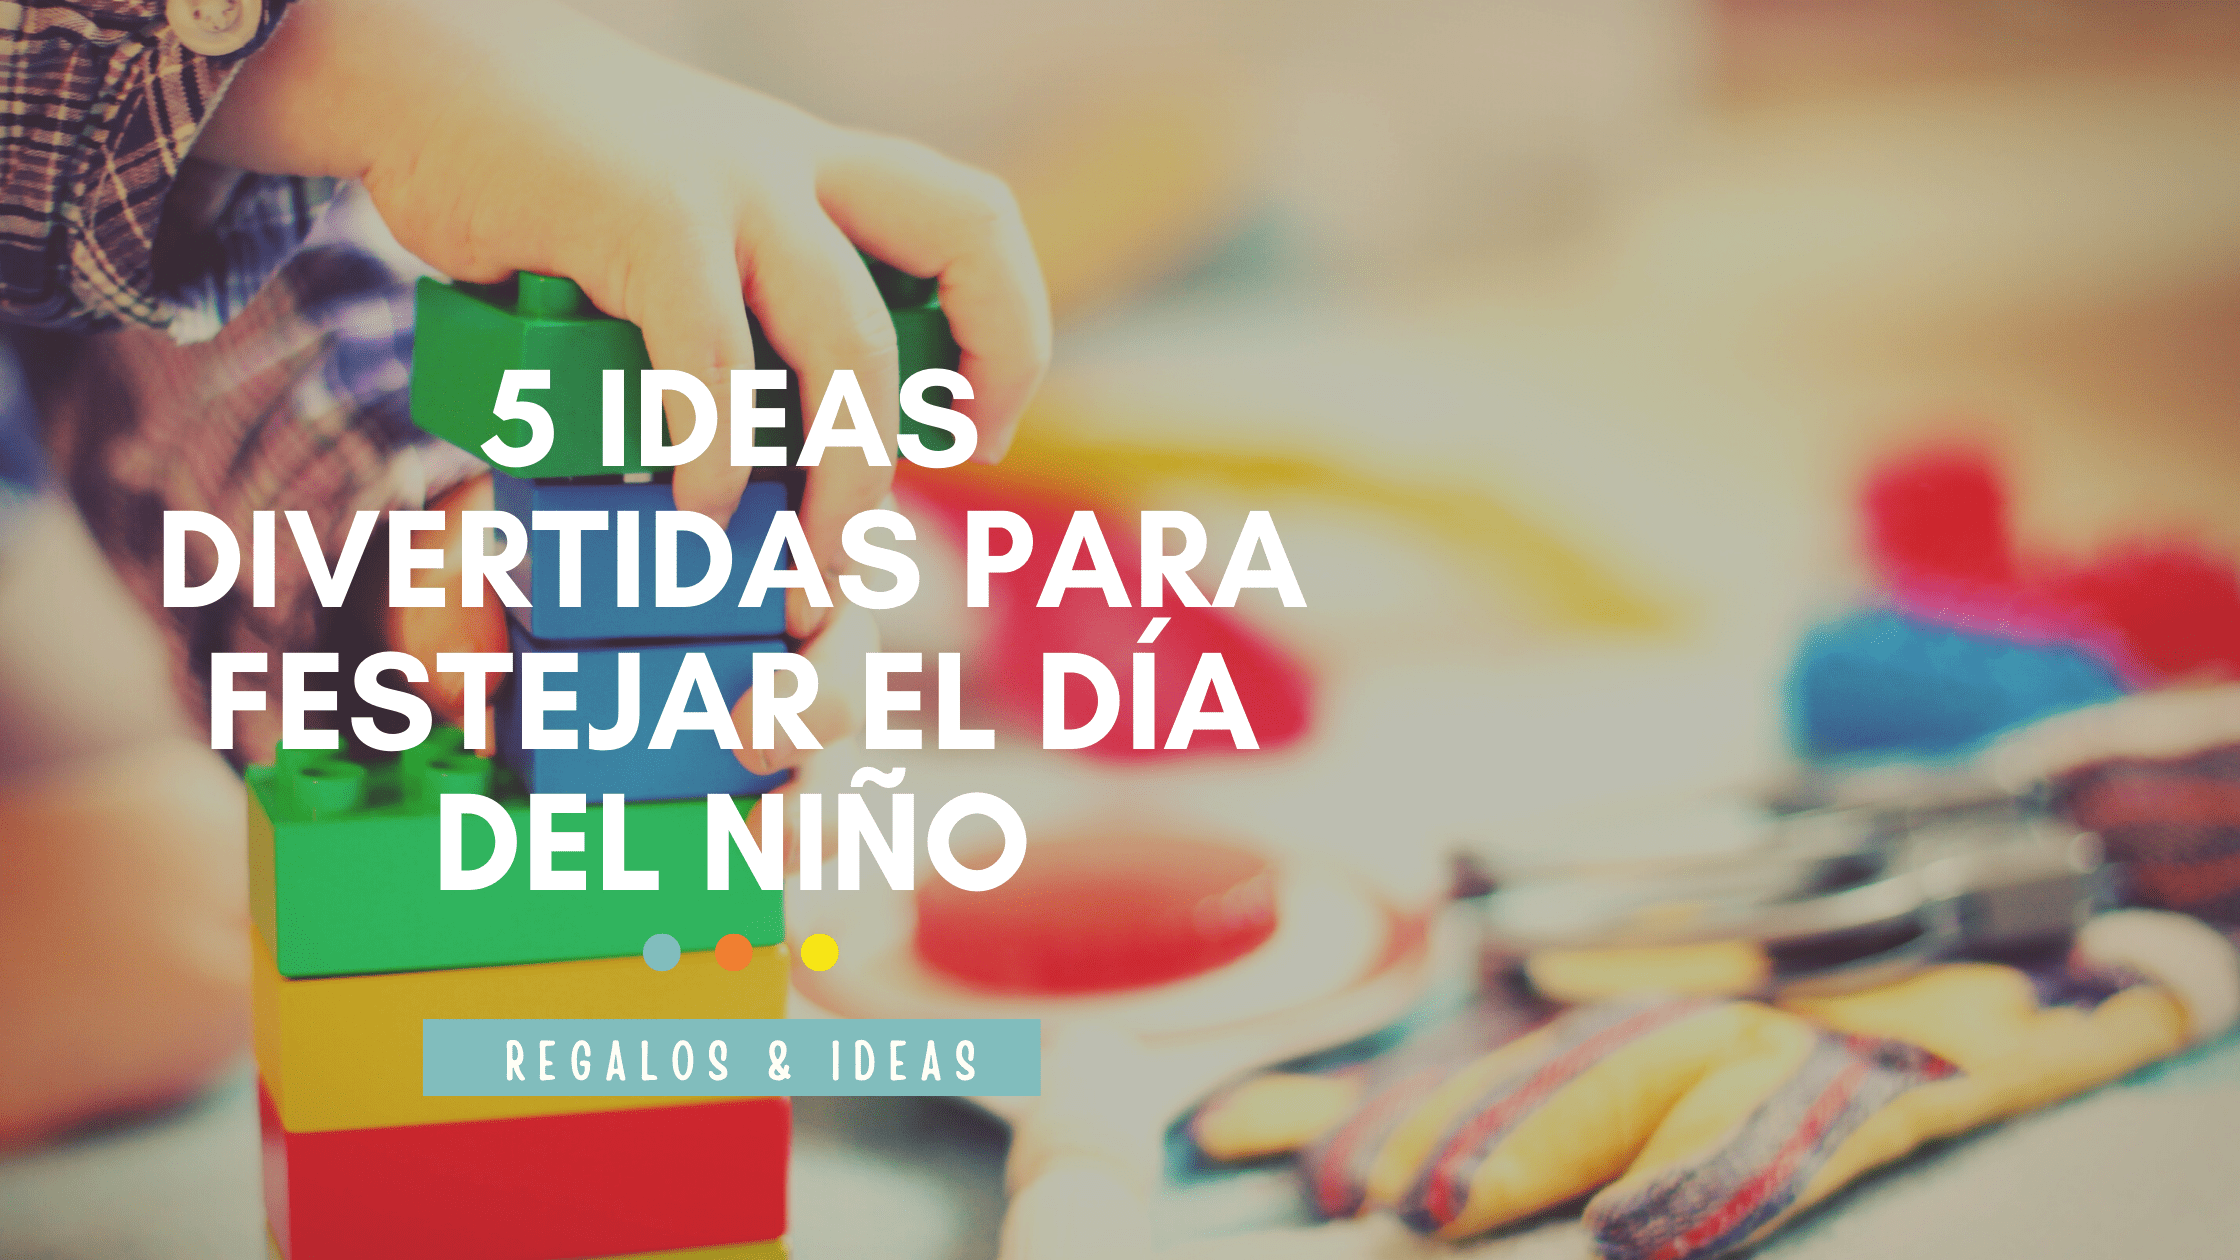 5 ideas dia del niño